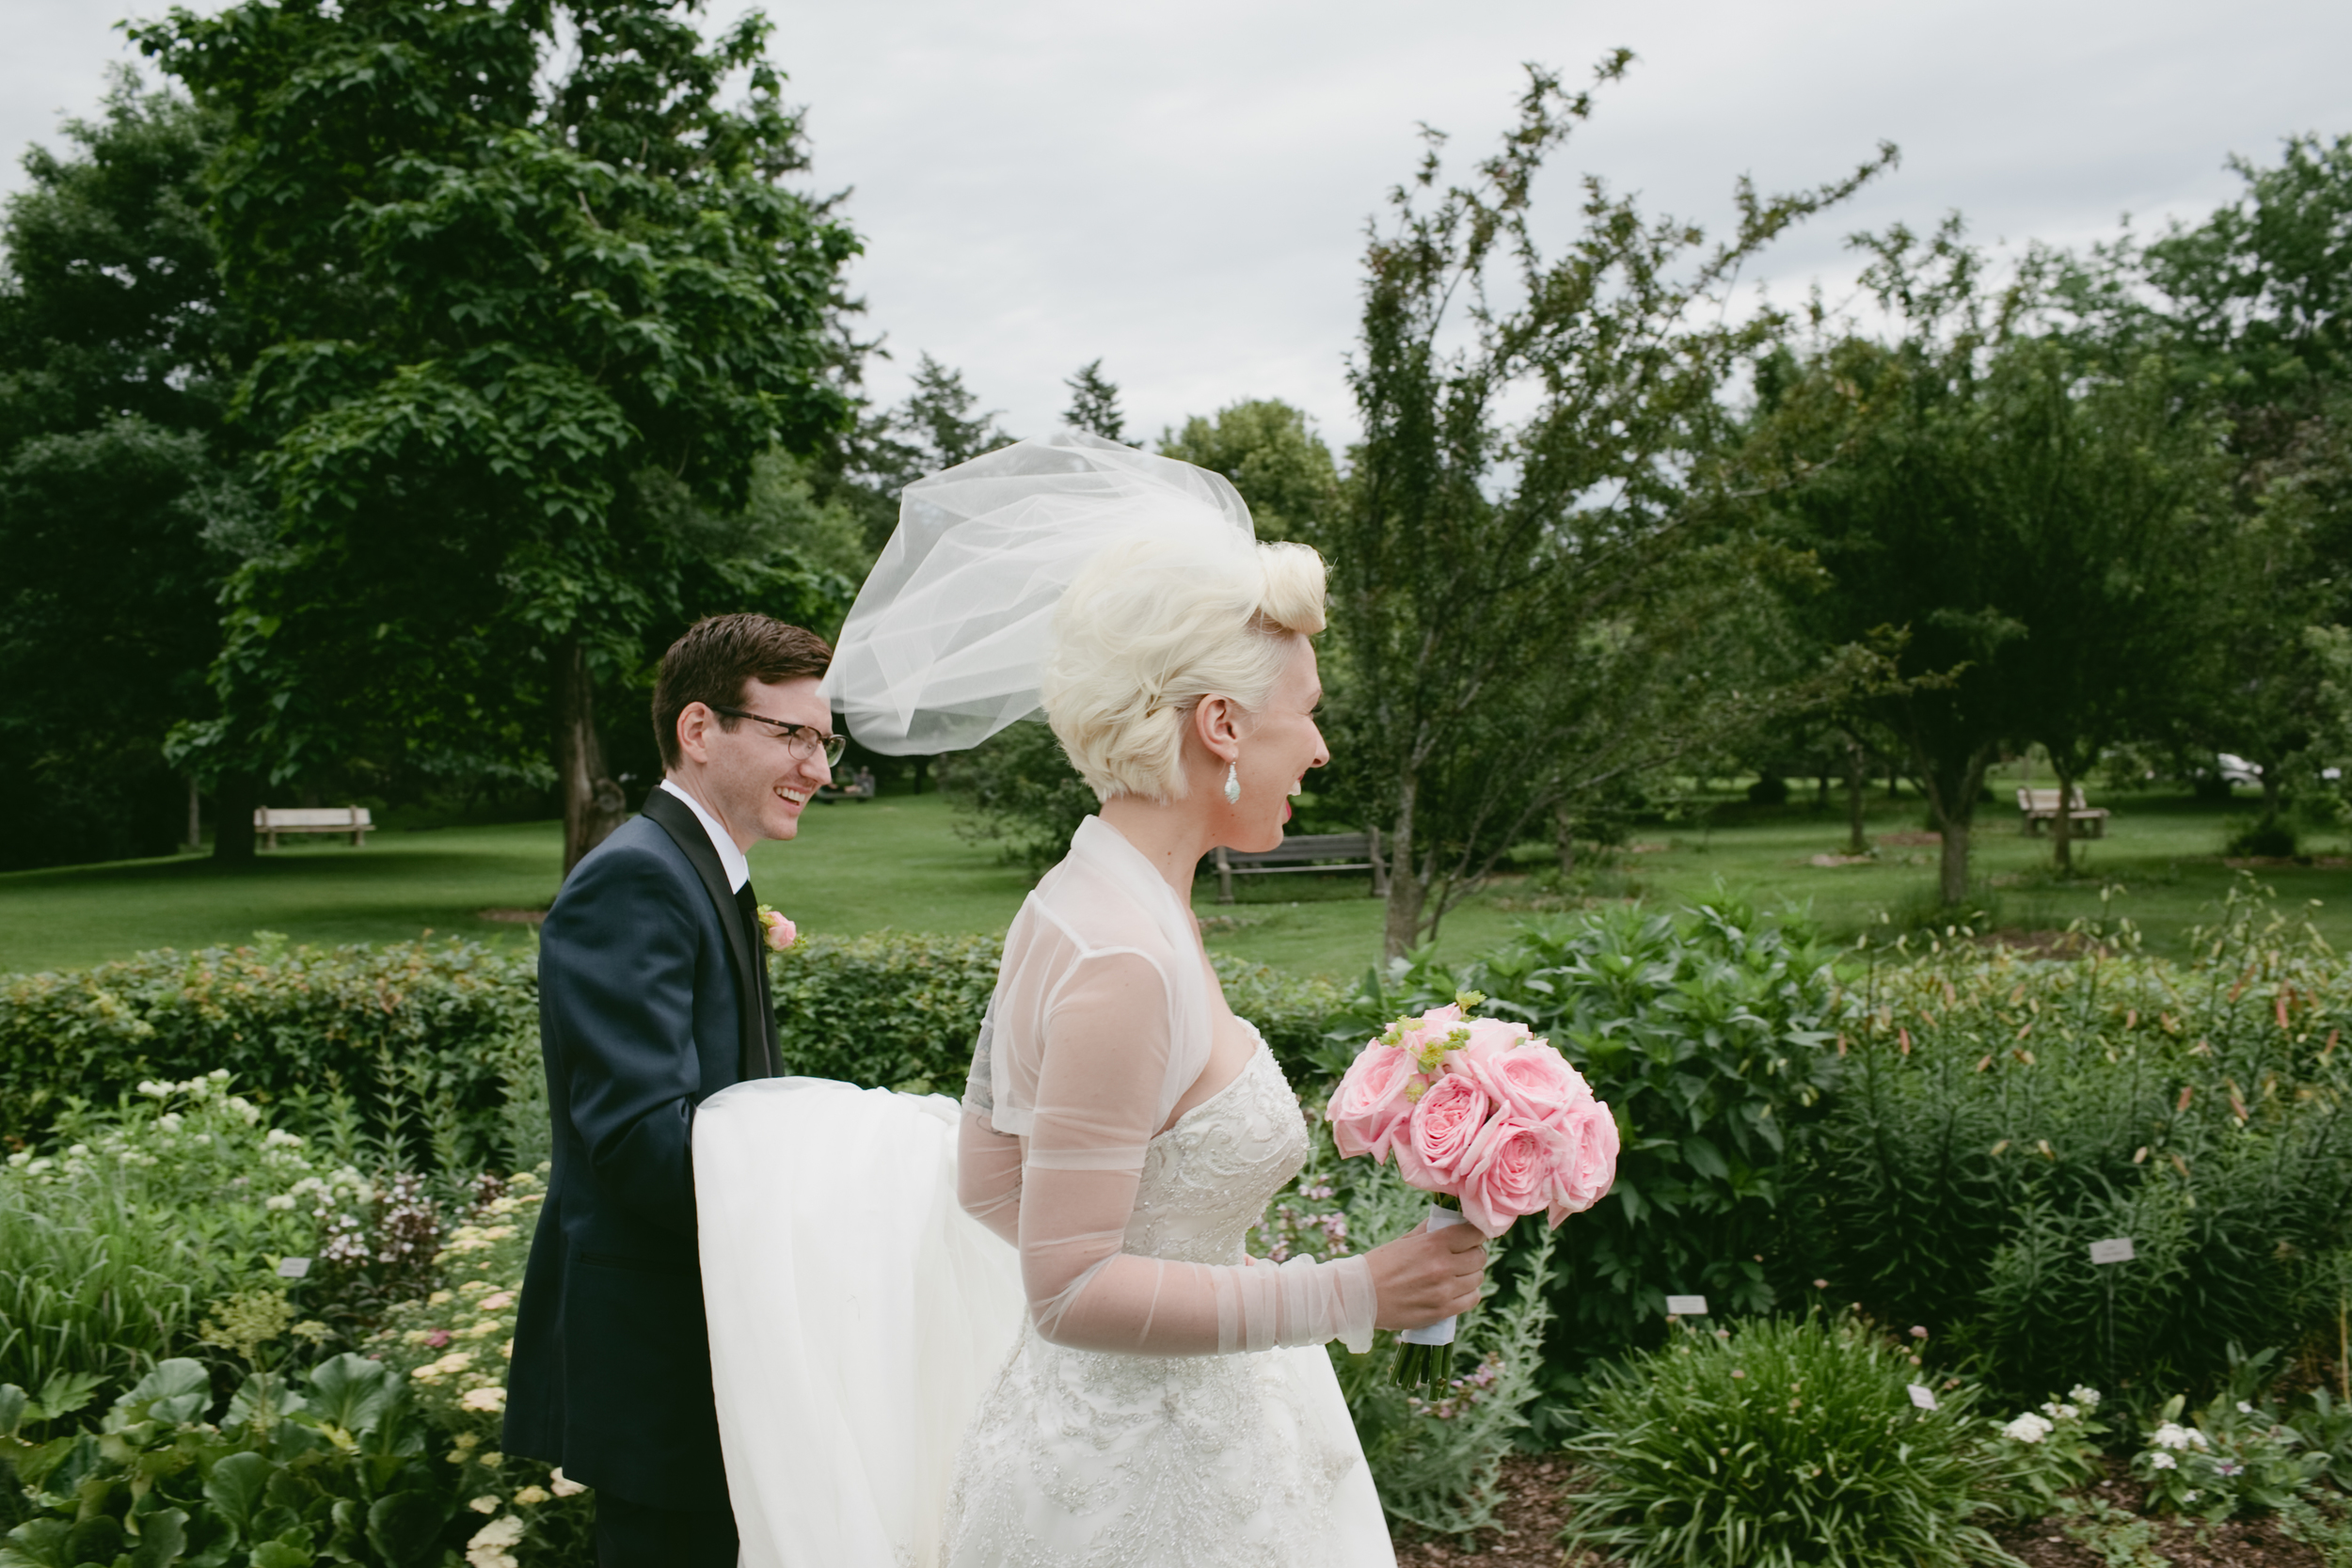 Rose Garden in Minneapolis, MN